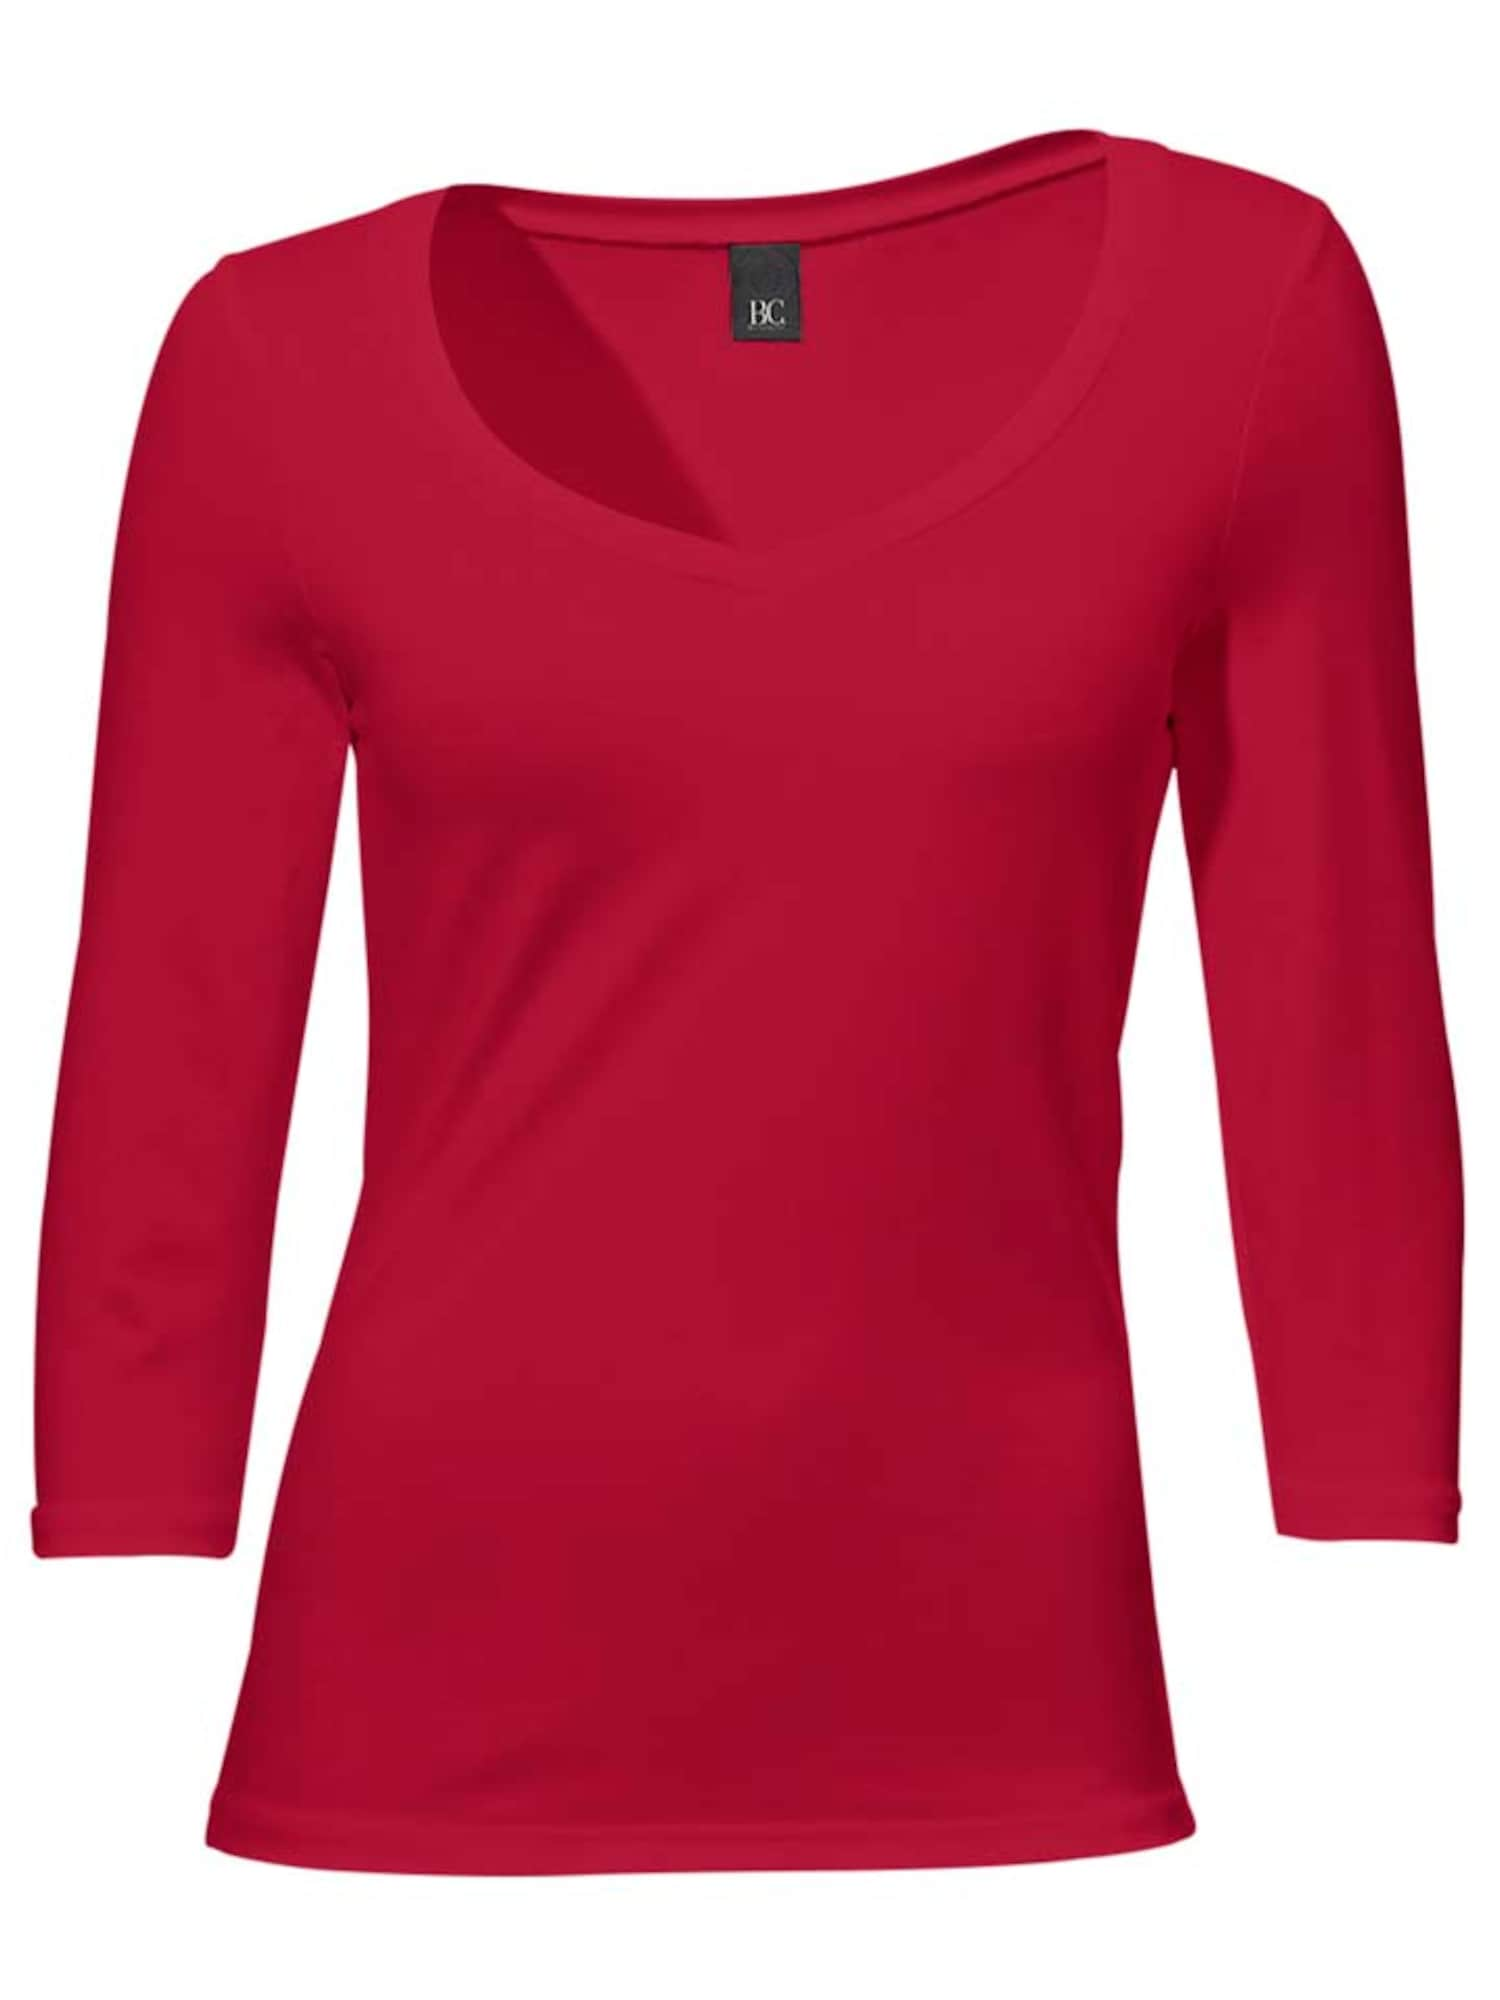 Ashley Brooke by heine Marškinėliai raudona